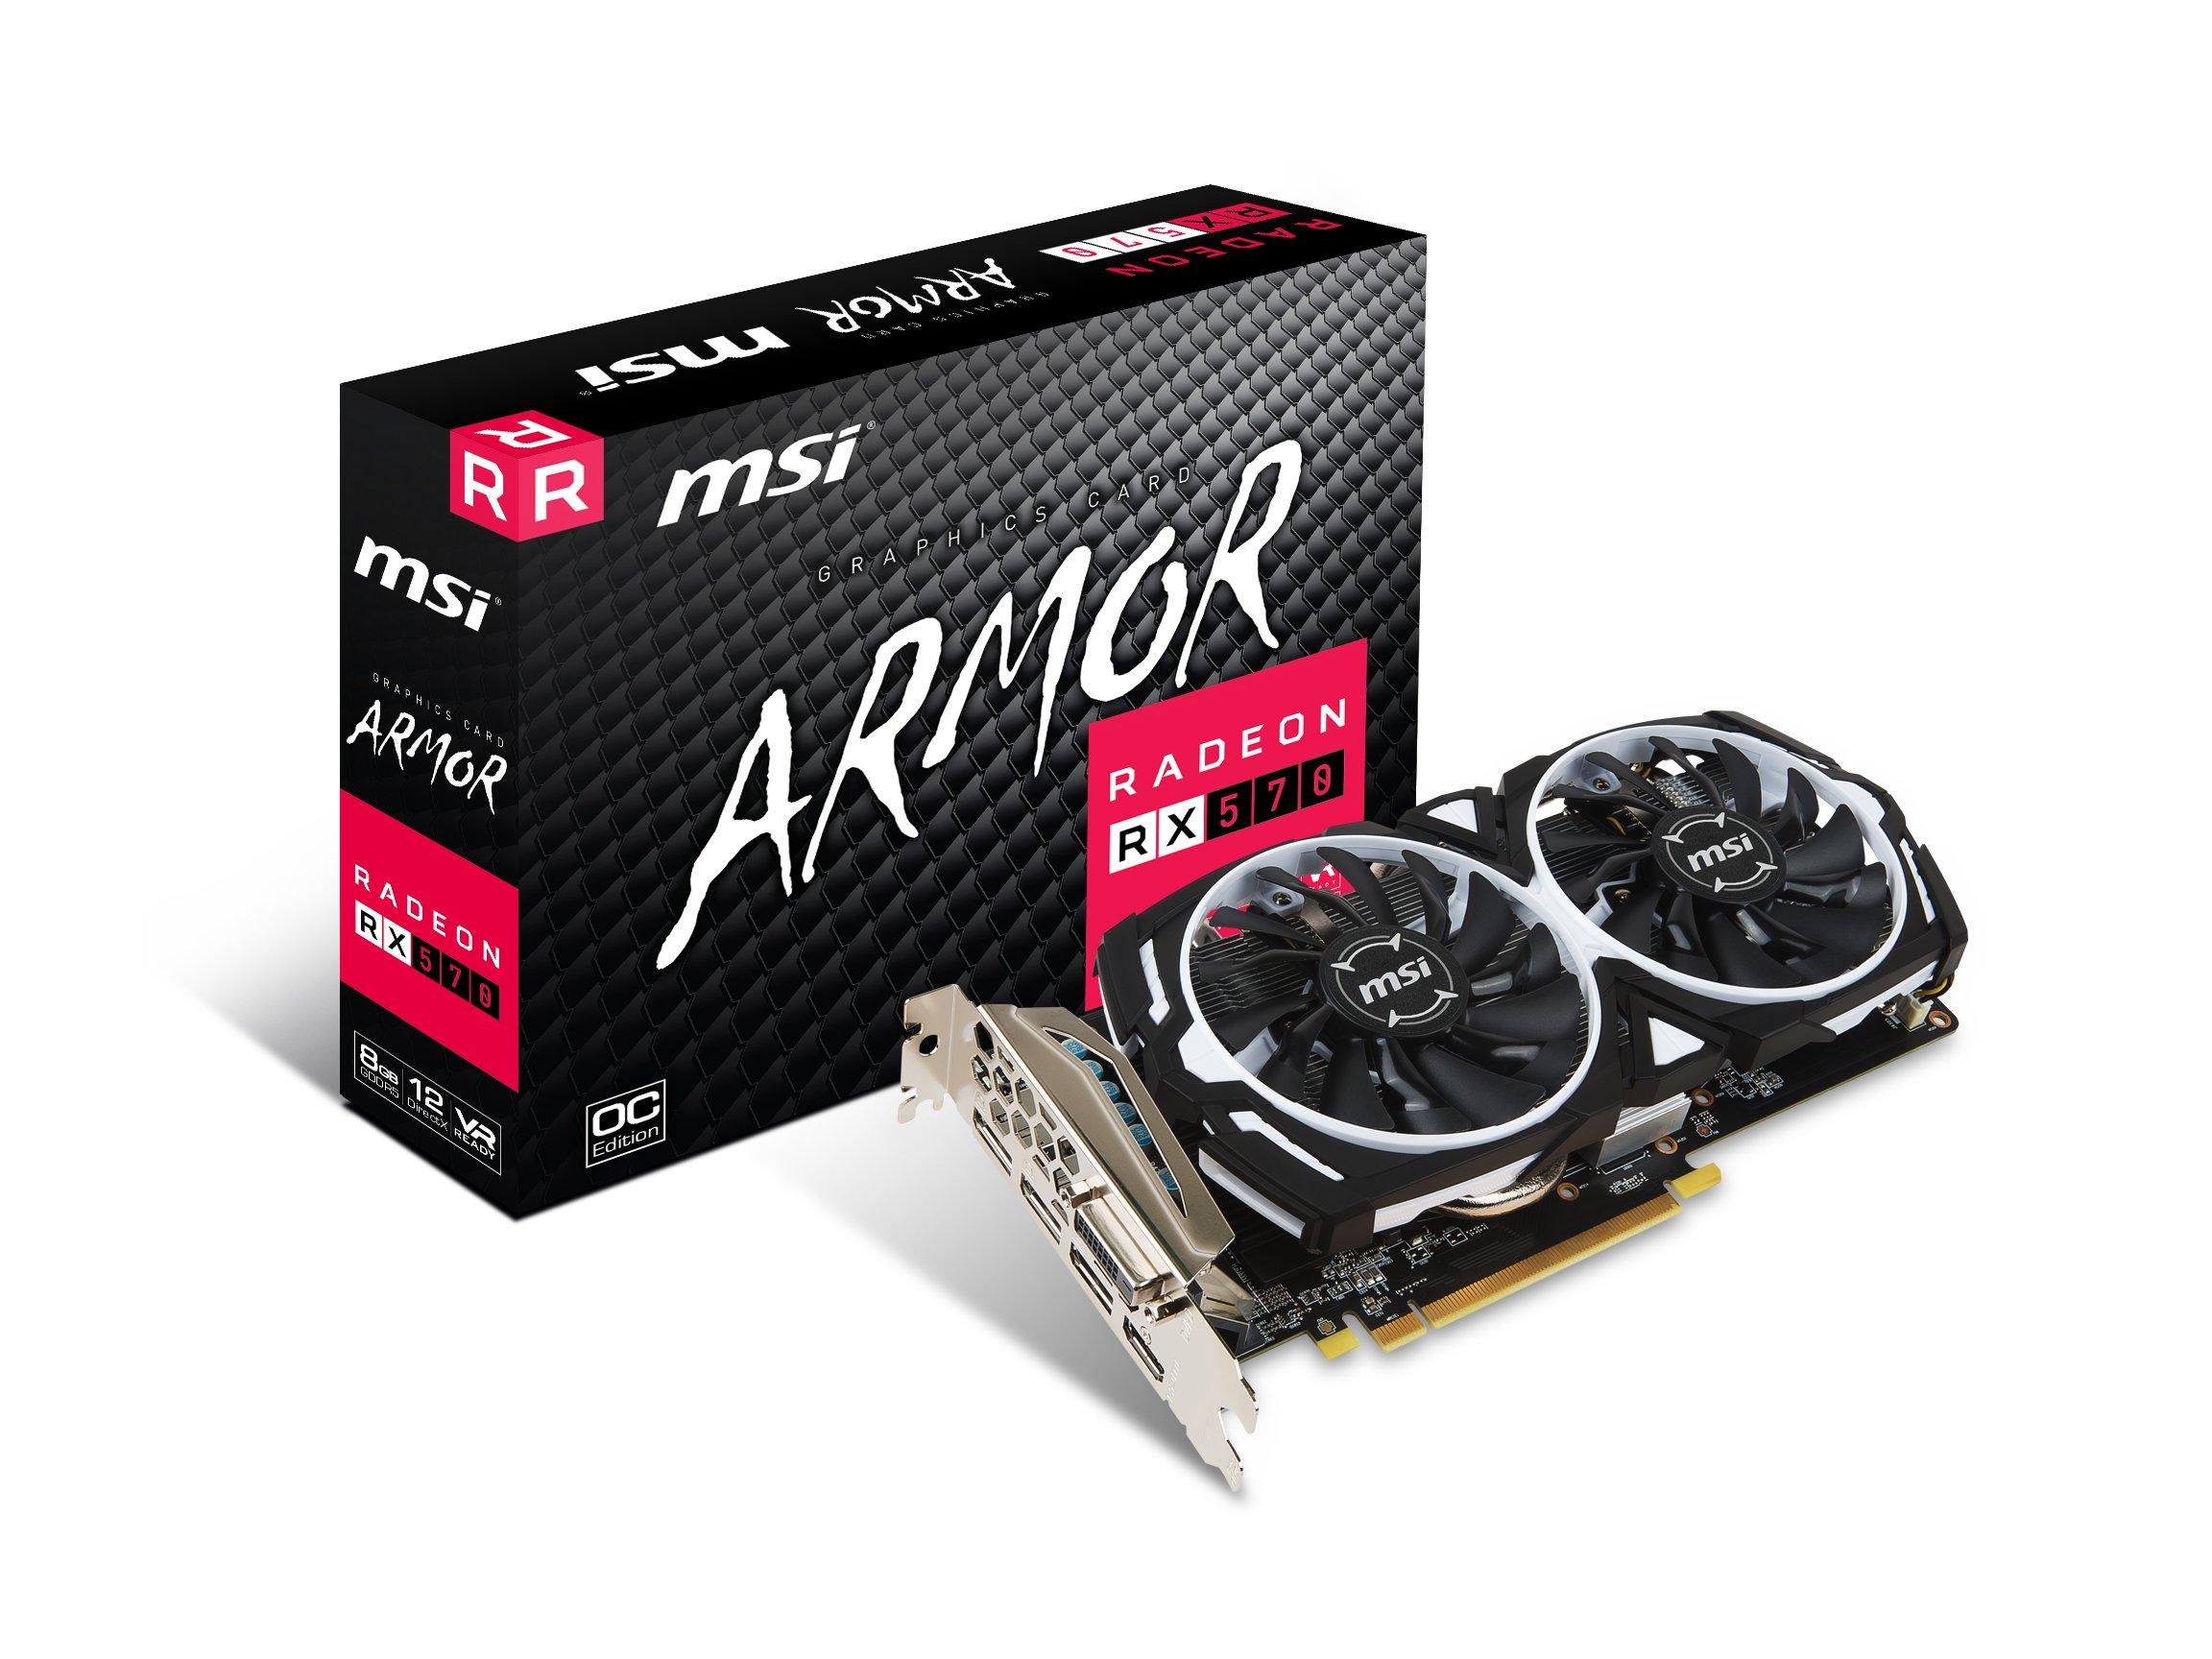 MSI GAMING Radeon RX 570 8GB GDDR5 256-Bit DirectX 12 Graphics Card (RX 570 ARMOR 8G OC)